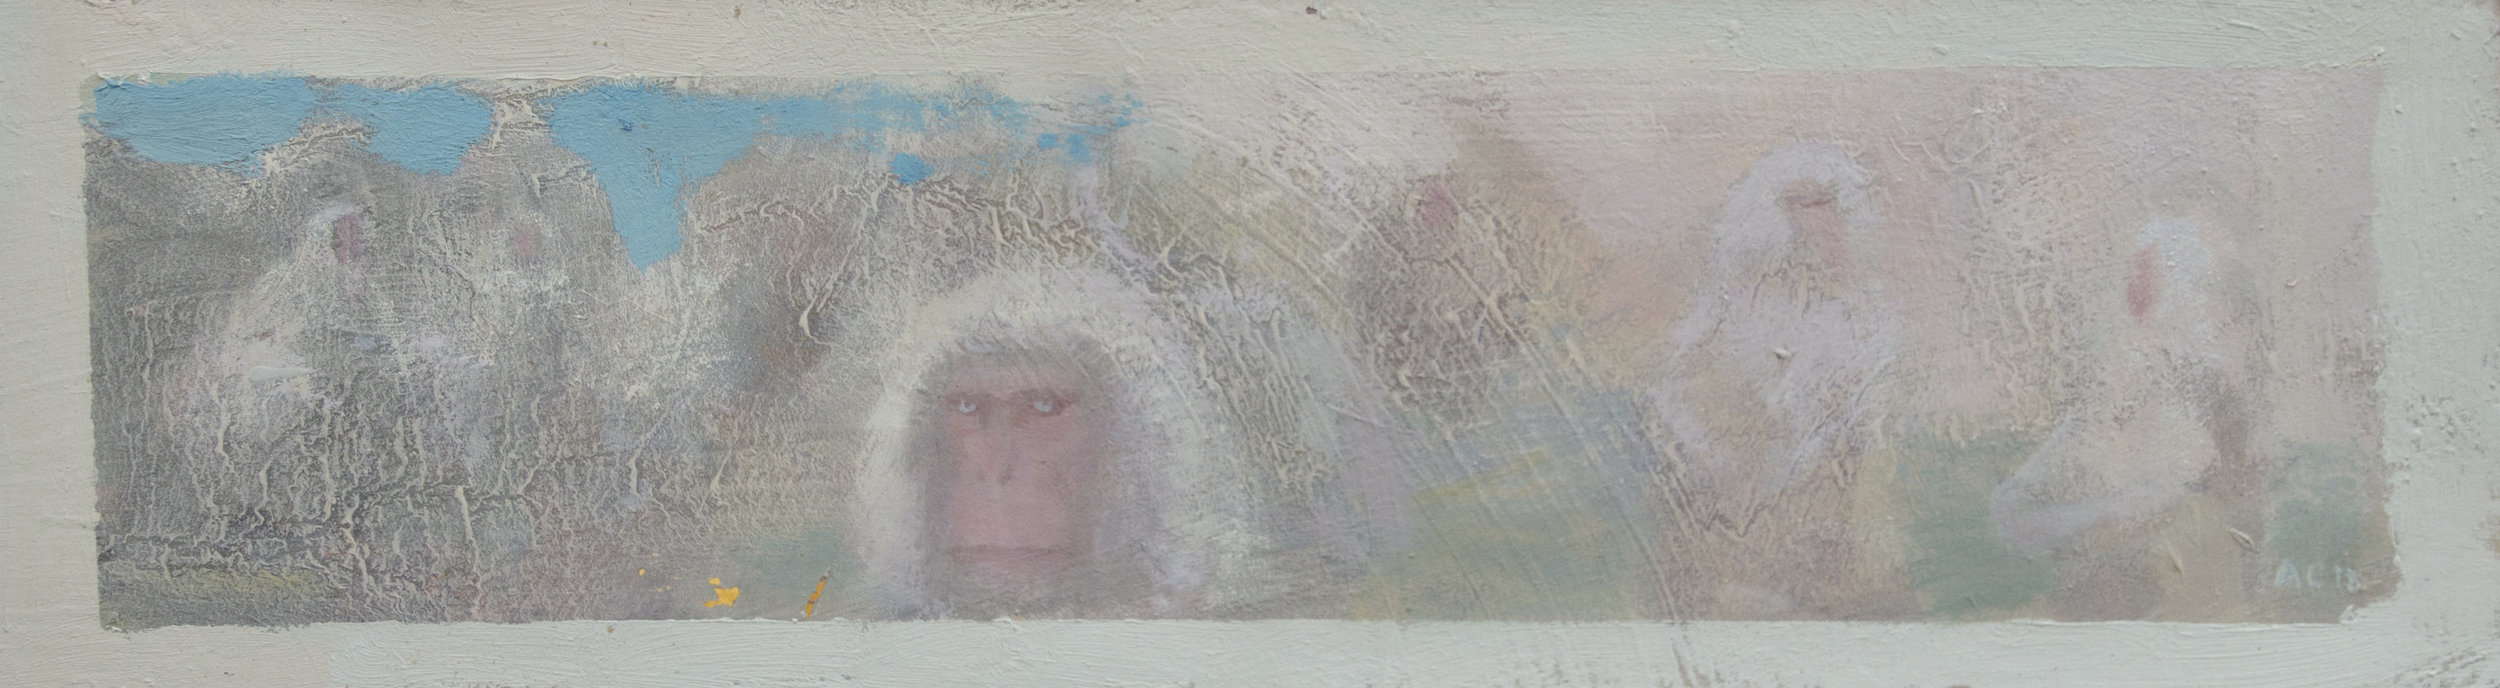 Copy of snow monkeys.jpg